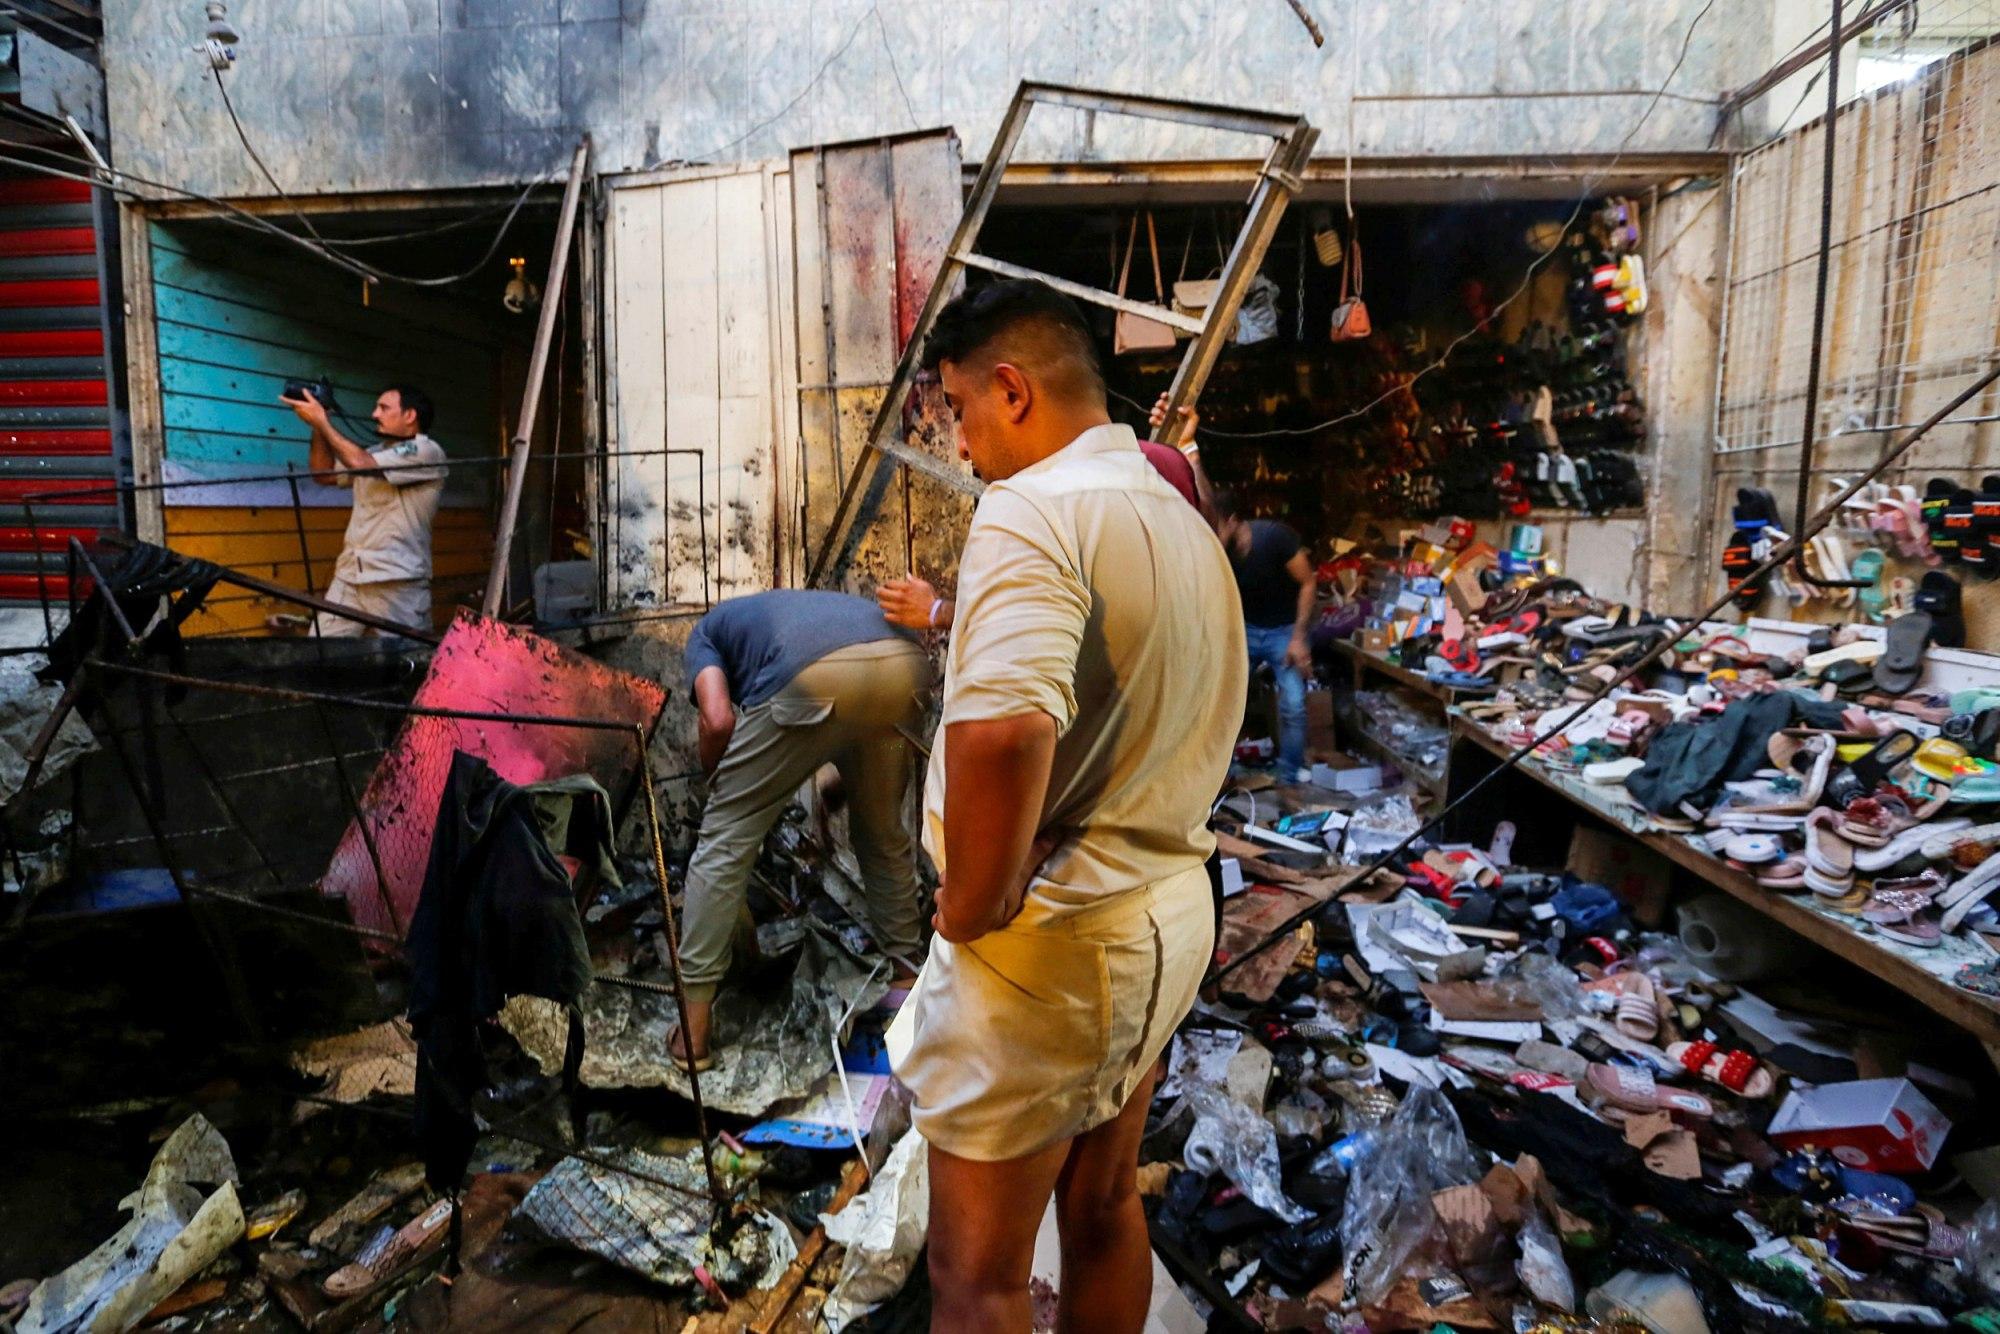 25 People Killed in Roadside Bomb Attack at Baghdad Market